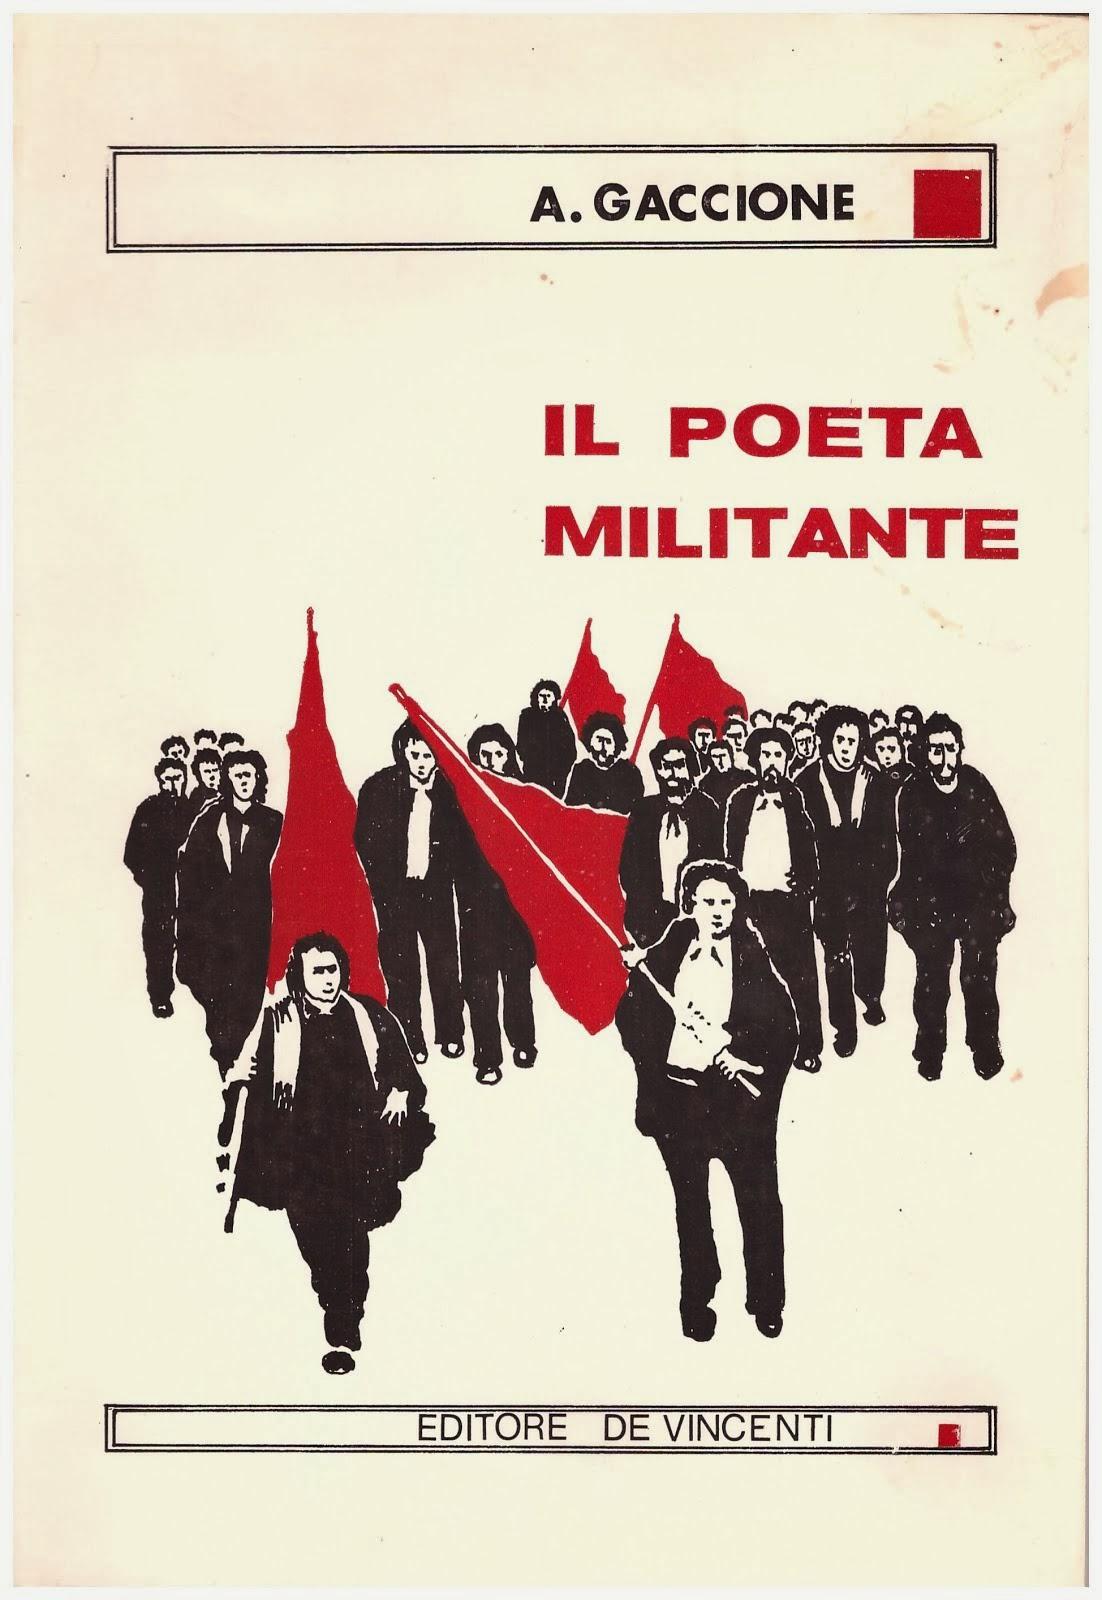 Il poeta militante